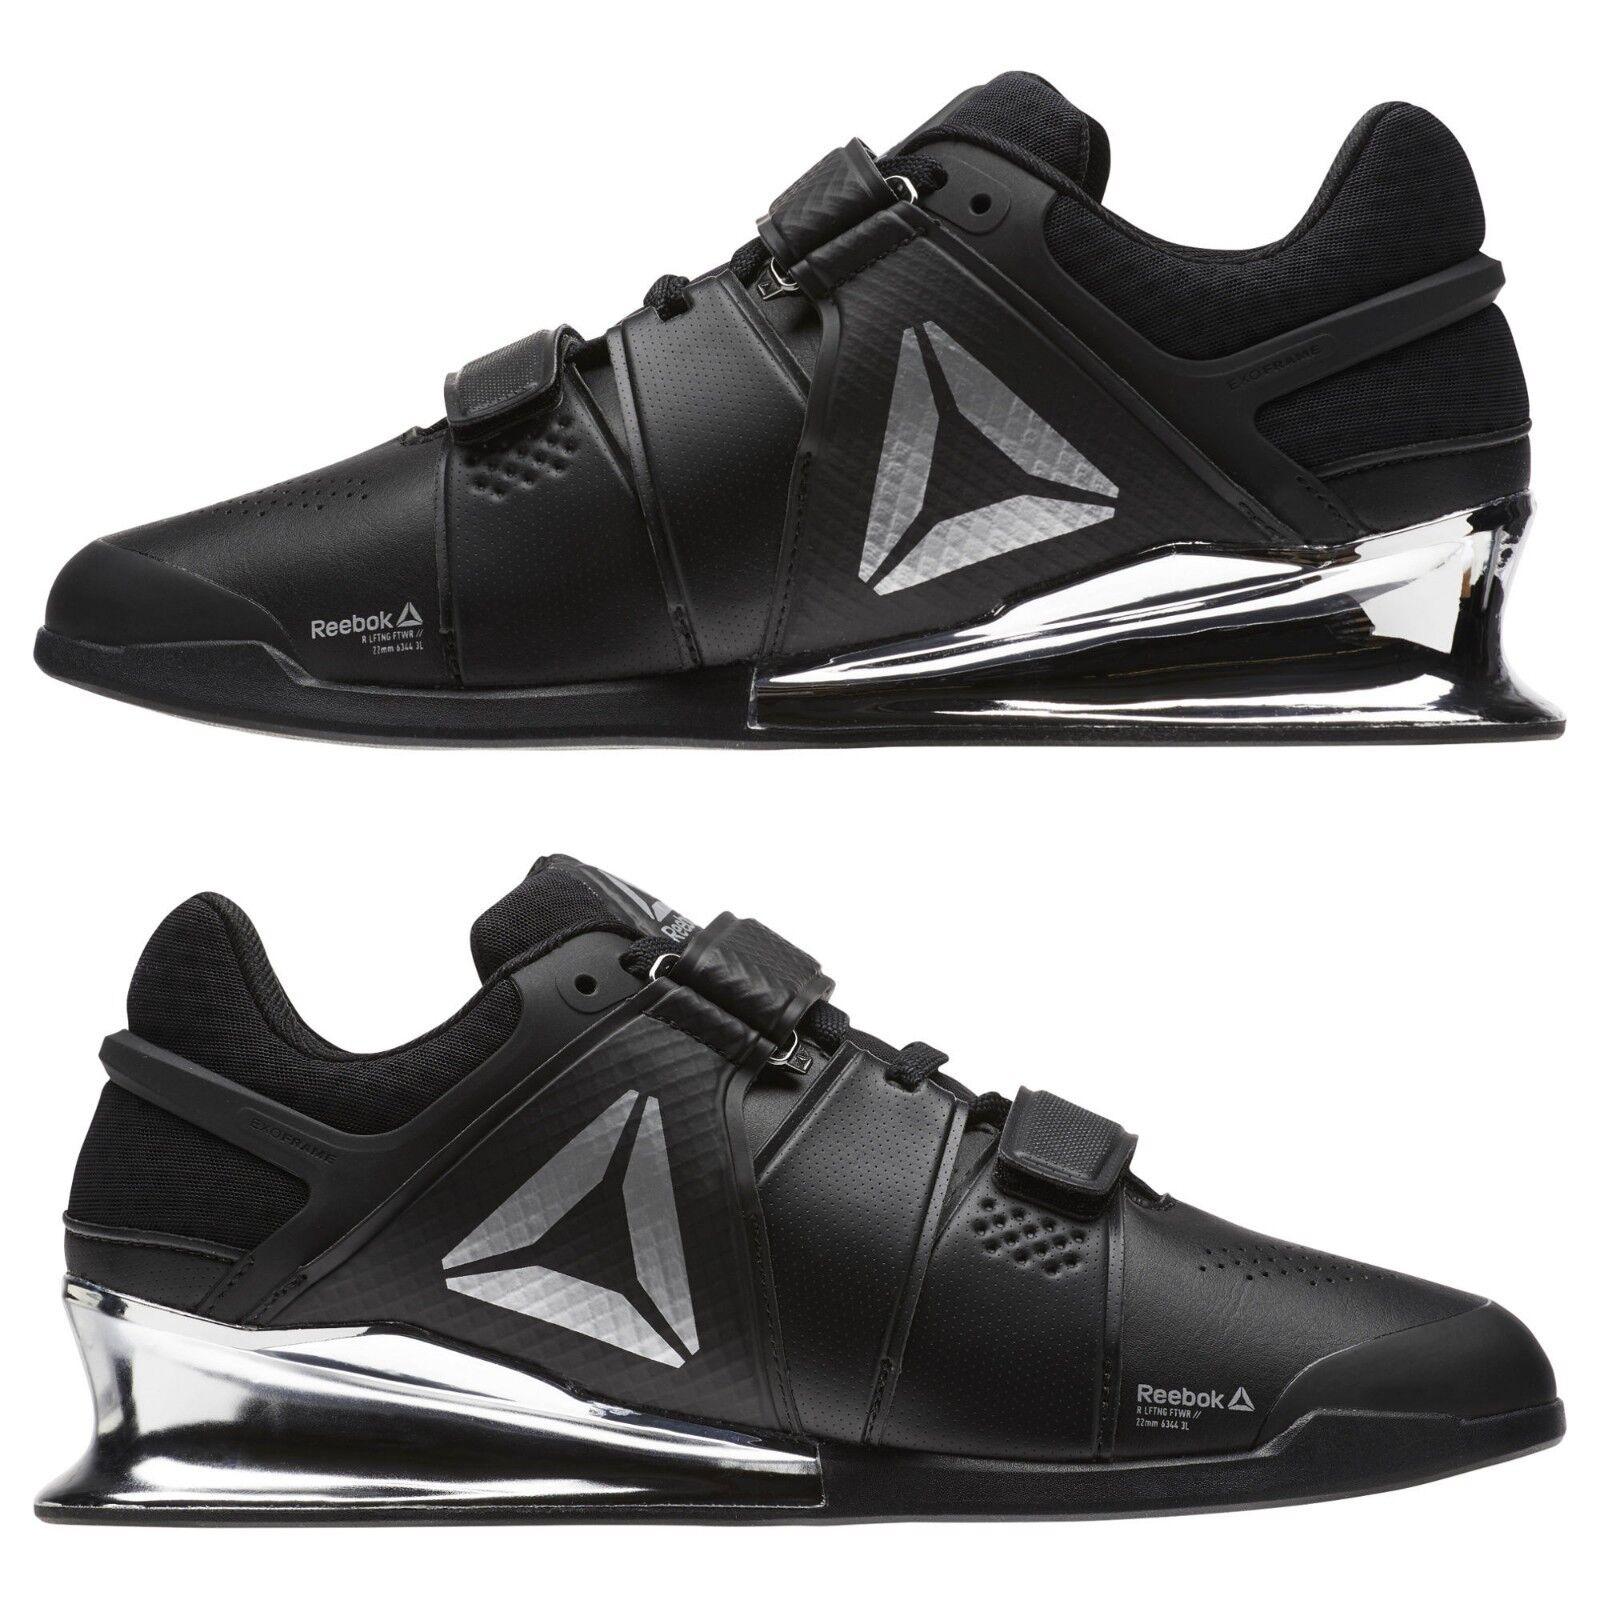 Reebok Legacy Lifter Men Weightlifting Training Gym shoes Black Silver CN1002